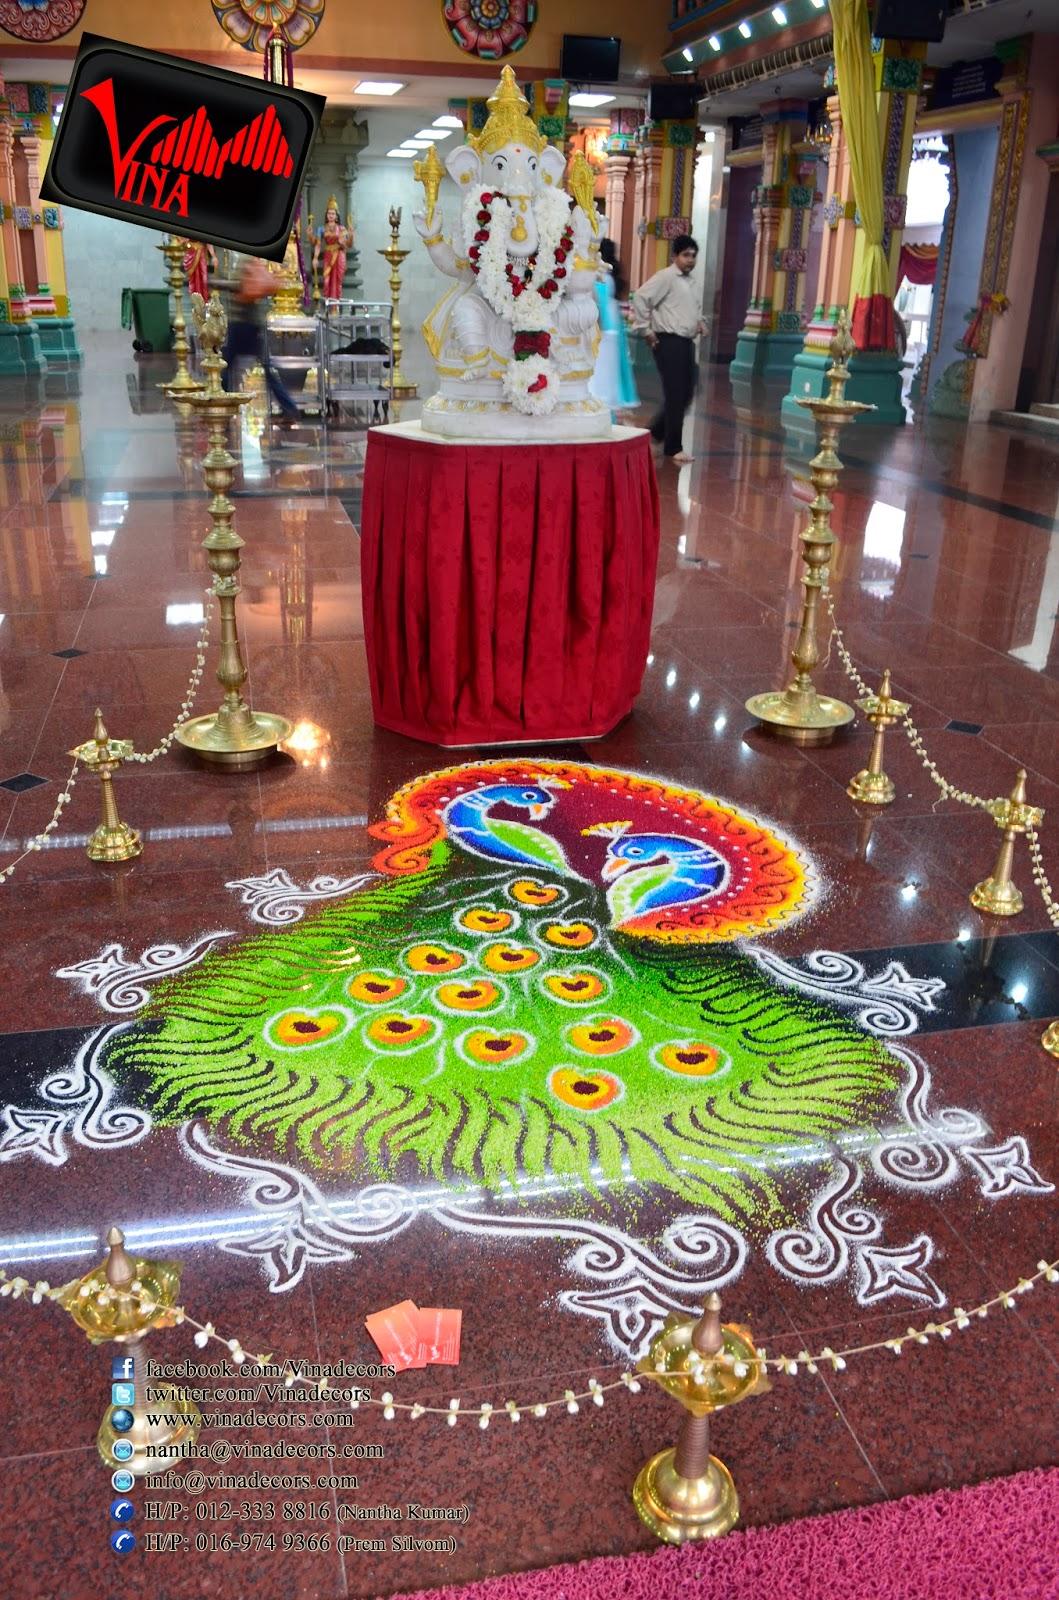 Sunrise Wedding at Sri Maha Mariamman Temple, Kuala Kumpur on 08/02/2014 (Manavarai / Mandap Setting with fresh flowers and Kolam Setting by Vina Canopy & Decor